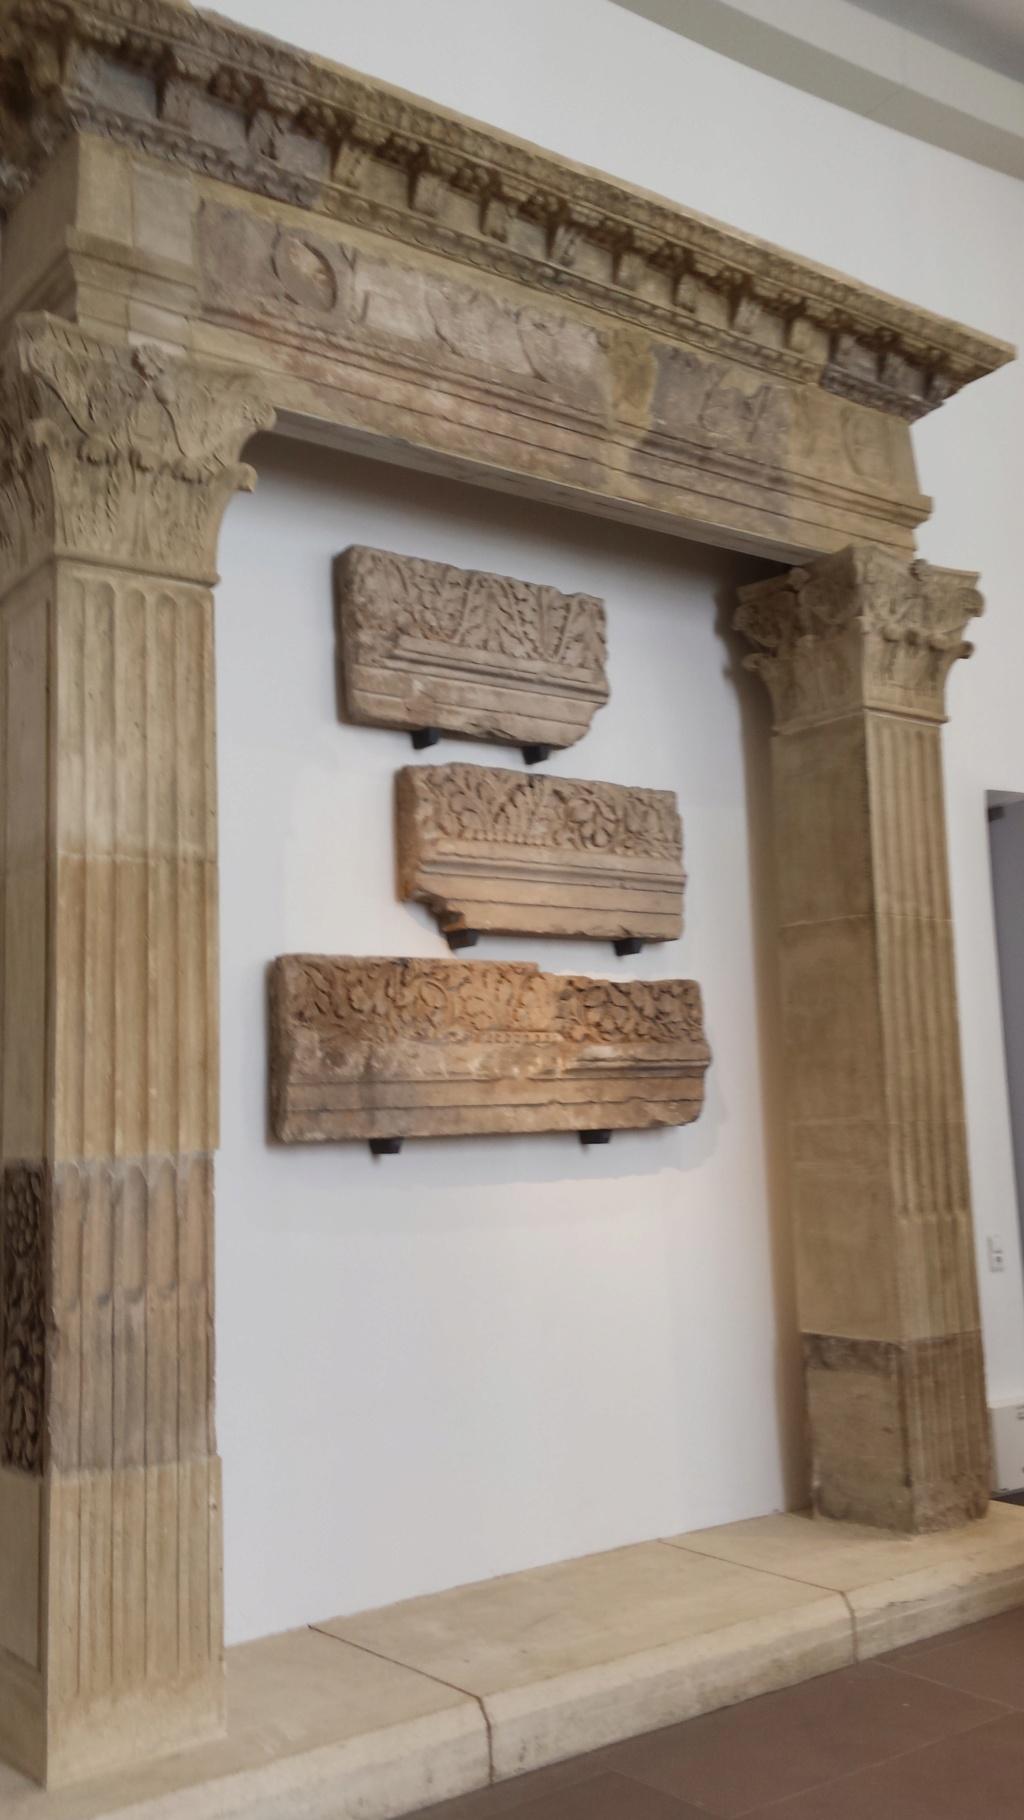 Museo Trier Alemania (ARQUEOLOGIA) 20150977